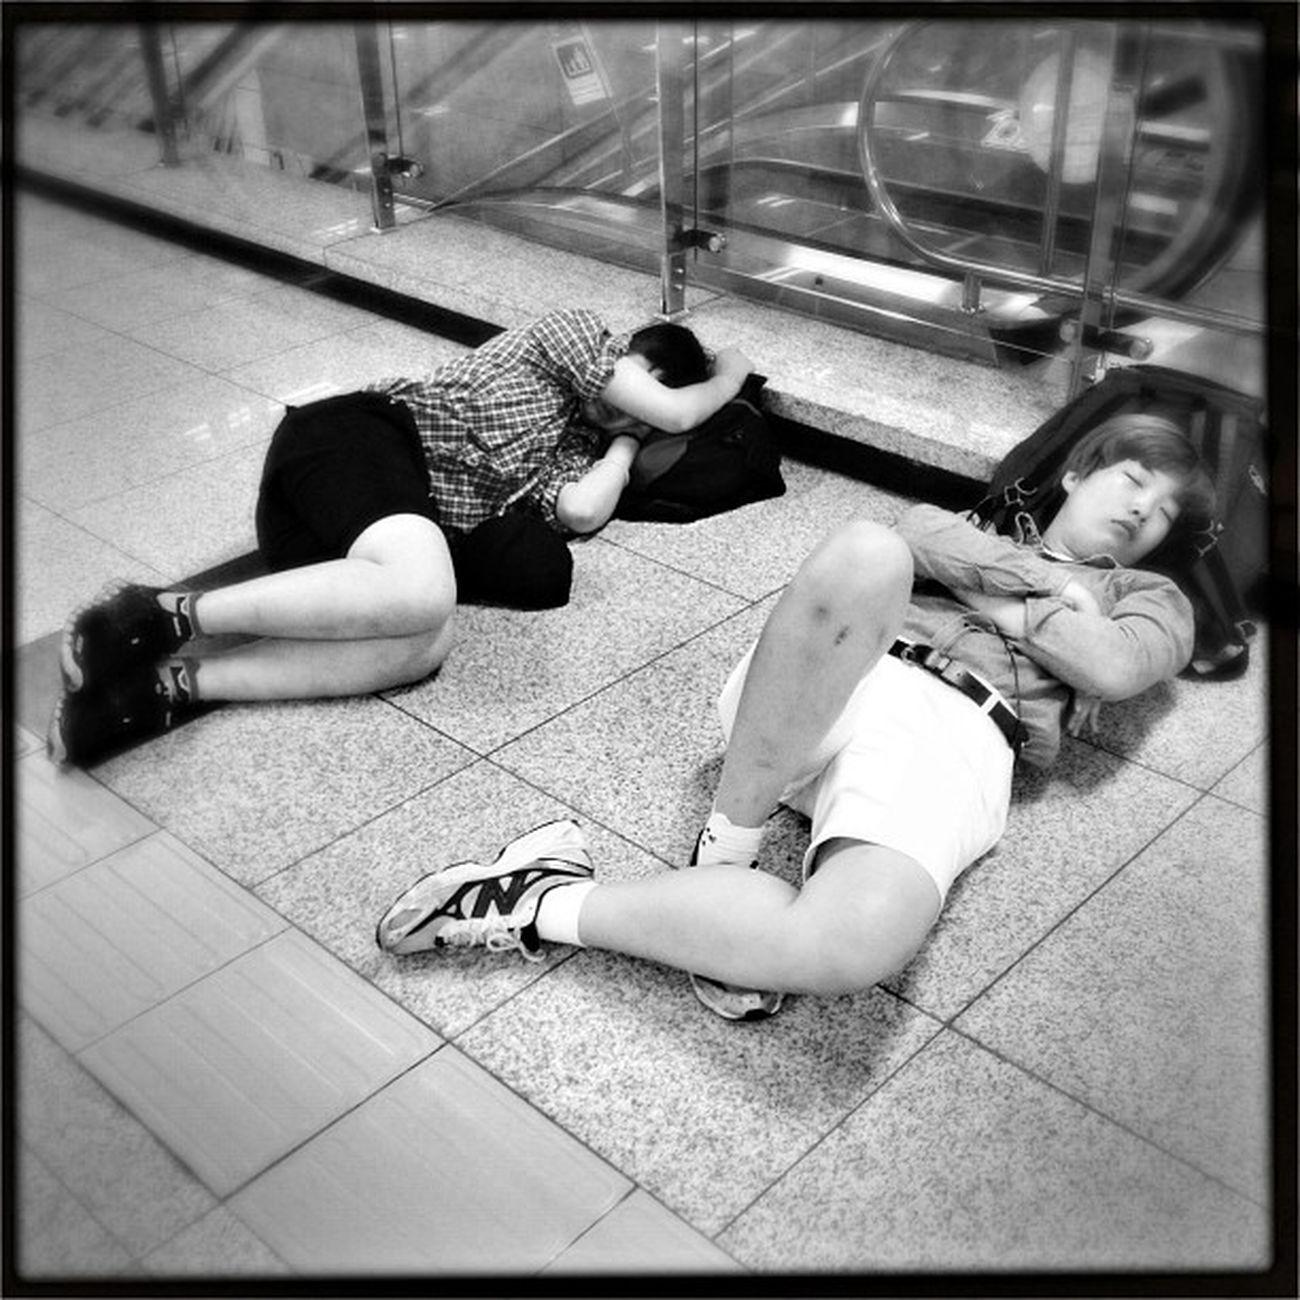 #korea #seoul_korea #gangnam #expressbusterminal #sleeperz #people #street #sleeping #travel Street People Sleeping Travel Korea Gangnam Seoul_korea Sleeperz Expressbusterminal